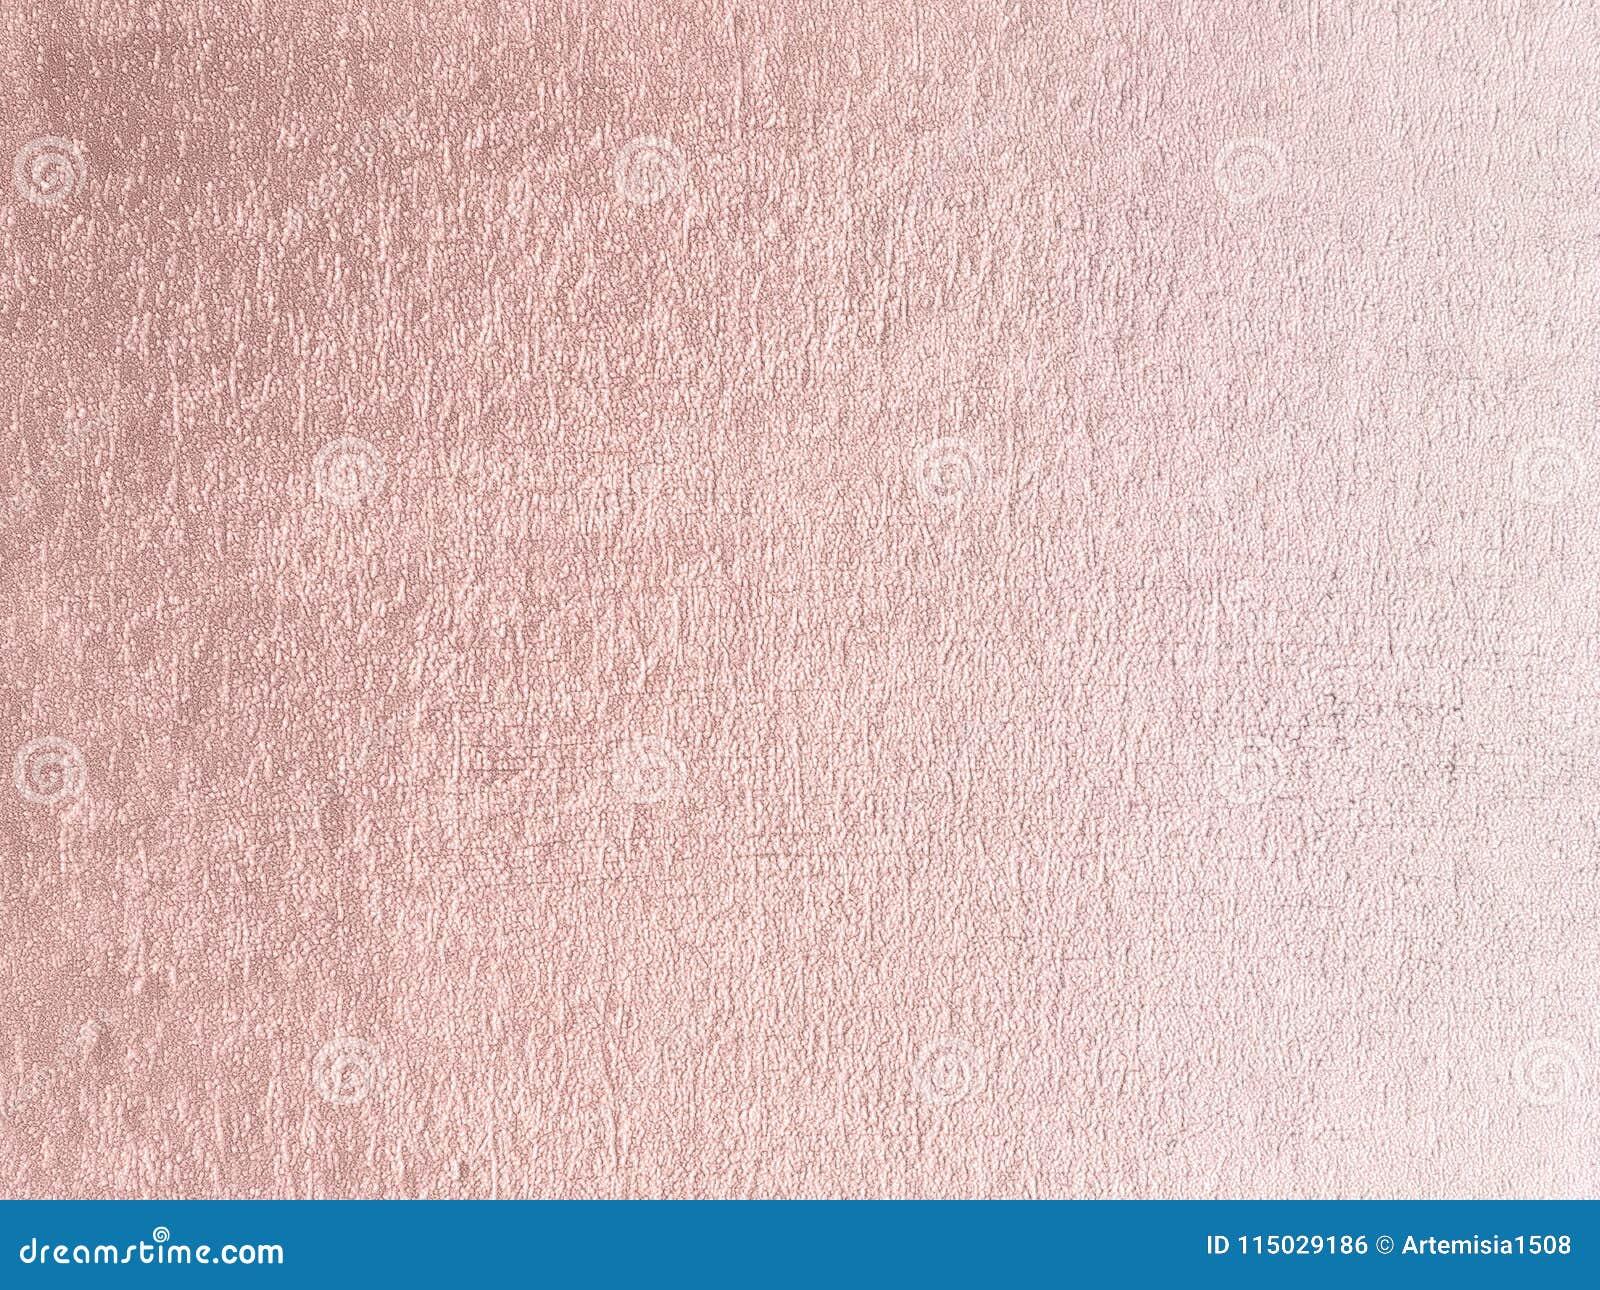 Rose gold background. Rose Gold metallic texture. Trendy templat